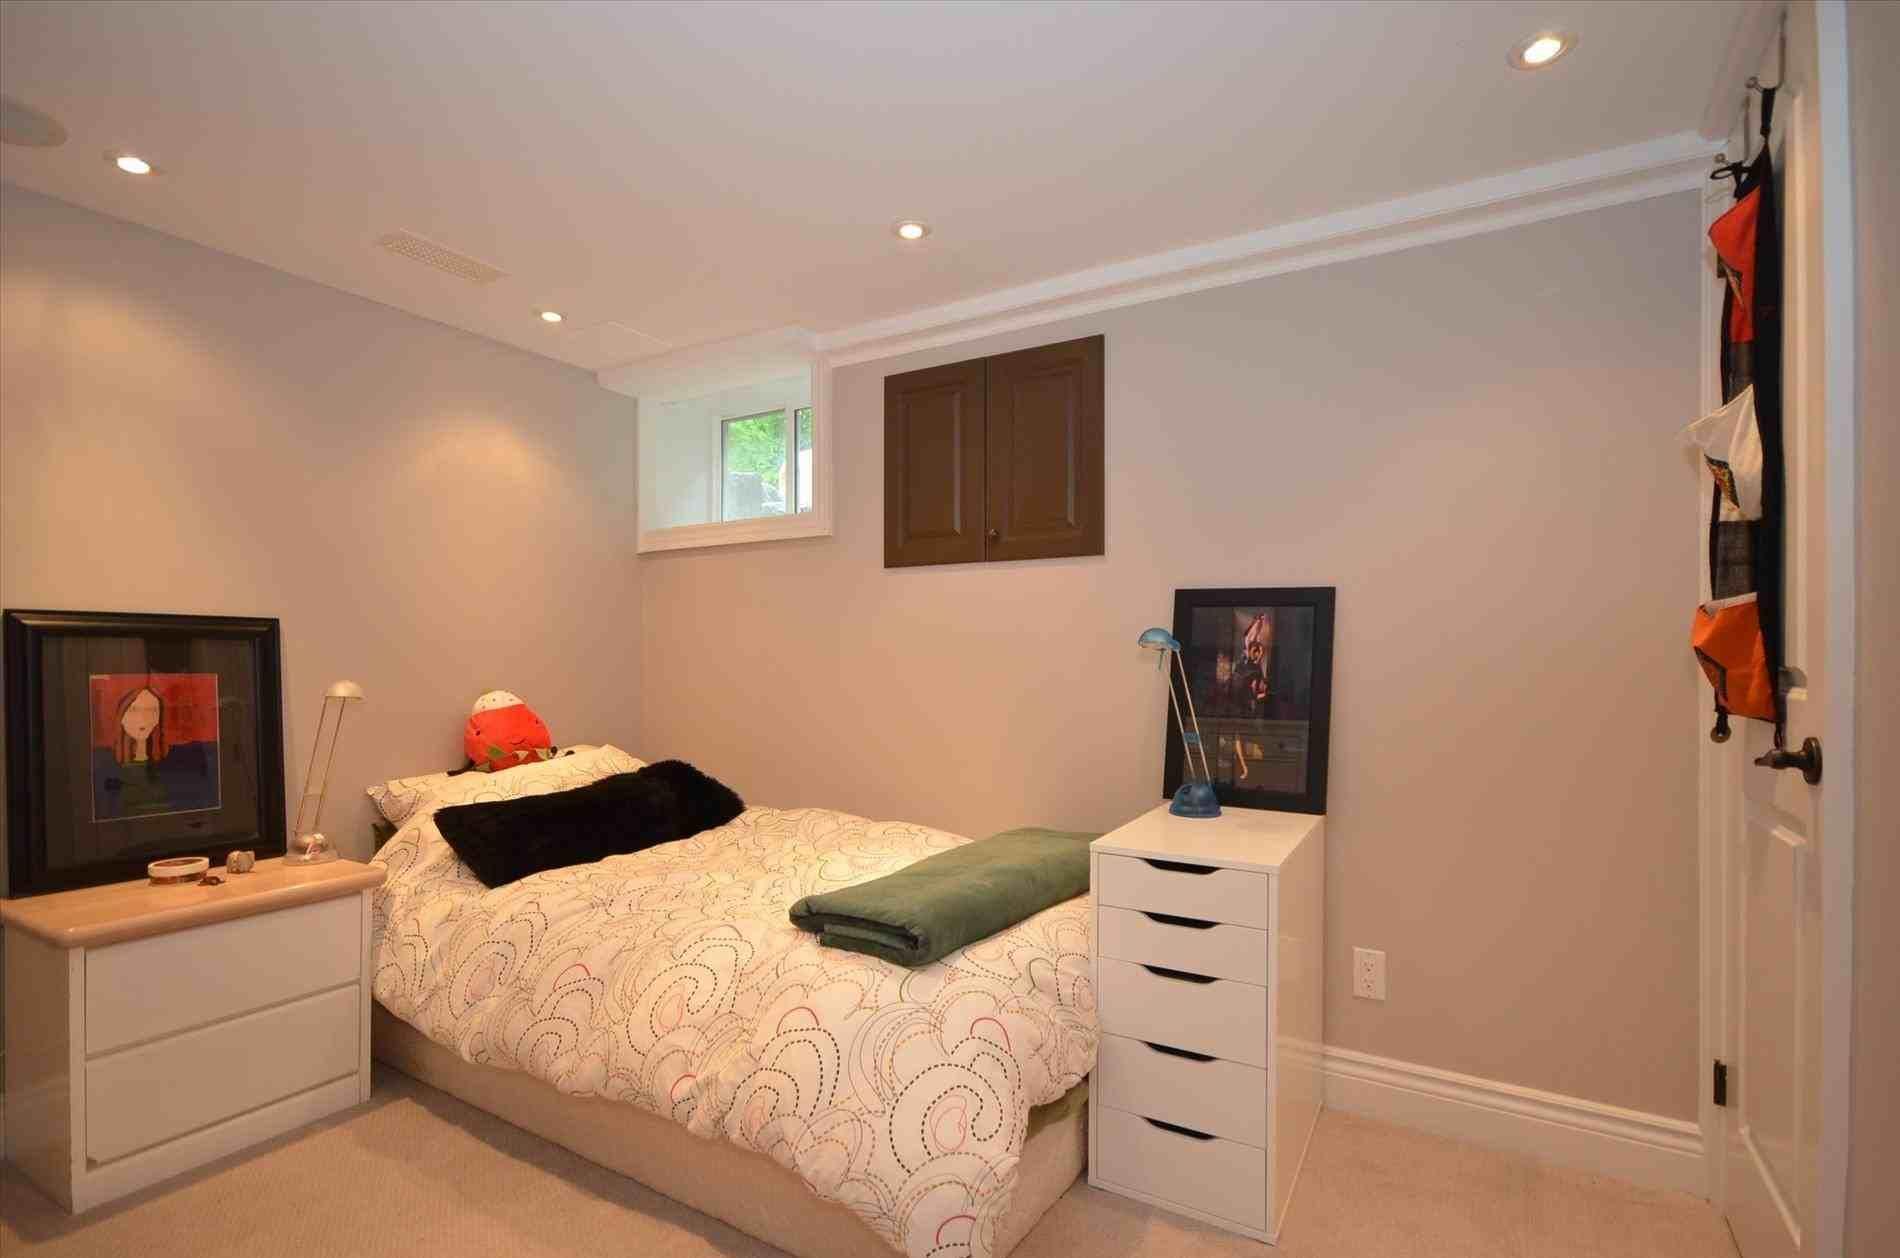 New Post Simple Single Bedroom Design Ideas Visit Bobayule Trending Decors Bedroom Design Interior Design Bedroom Small Basement Bedroom